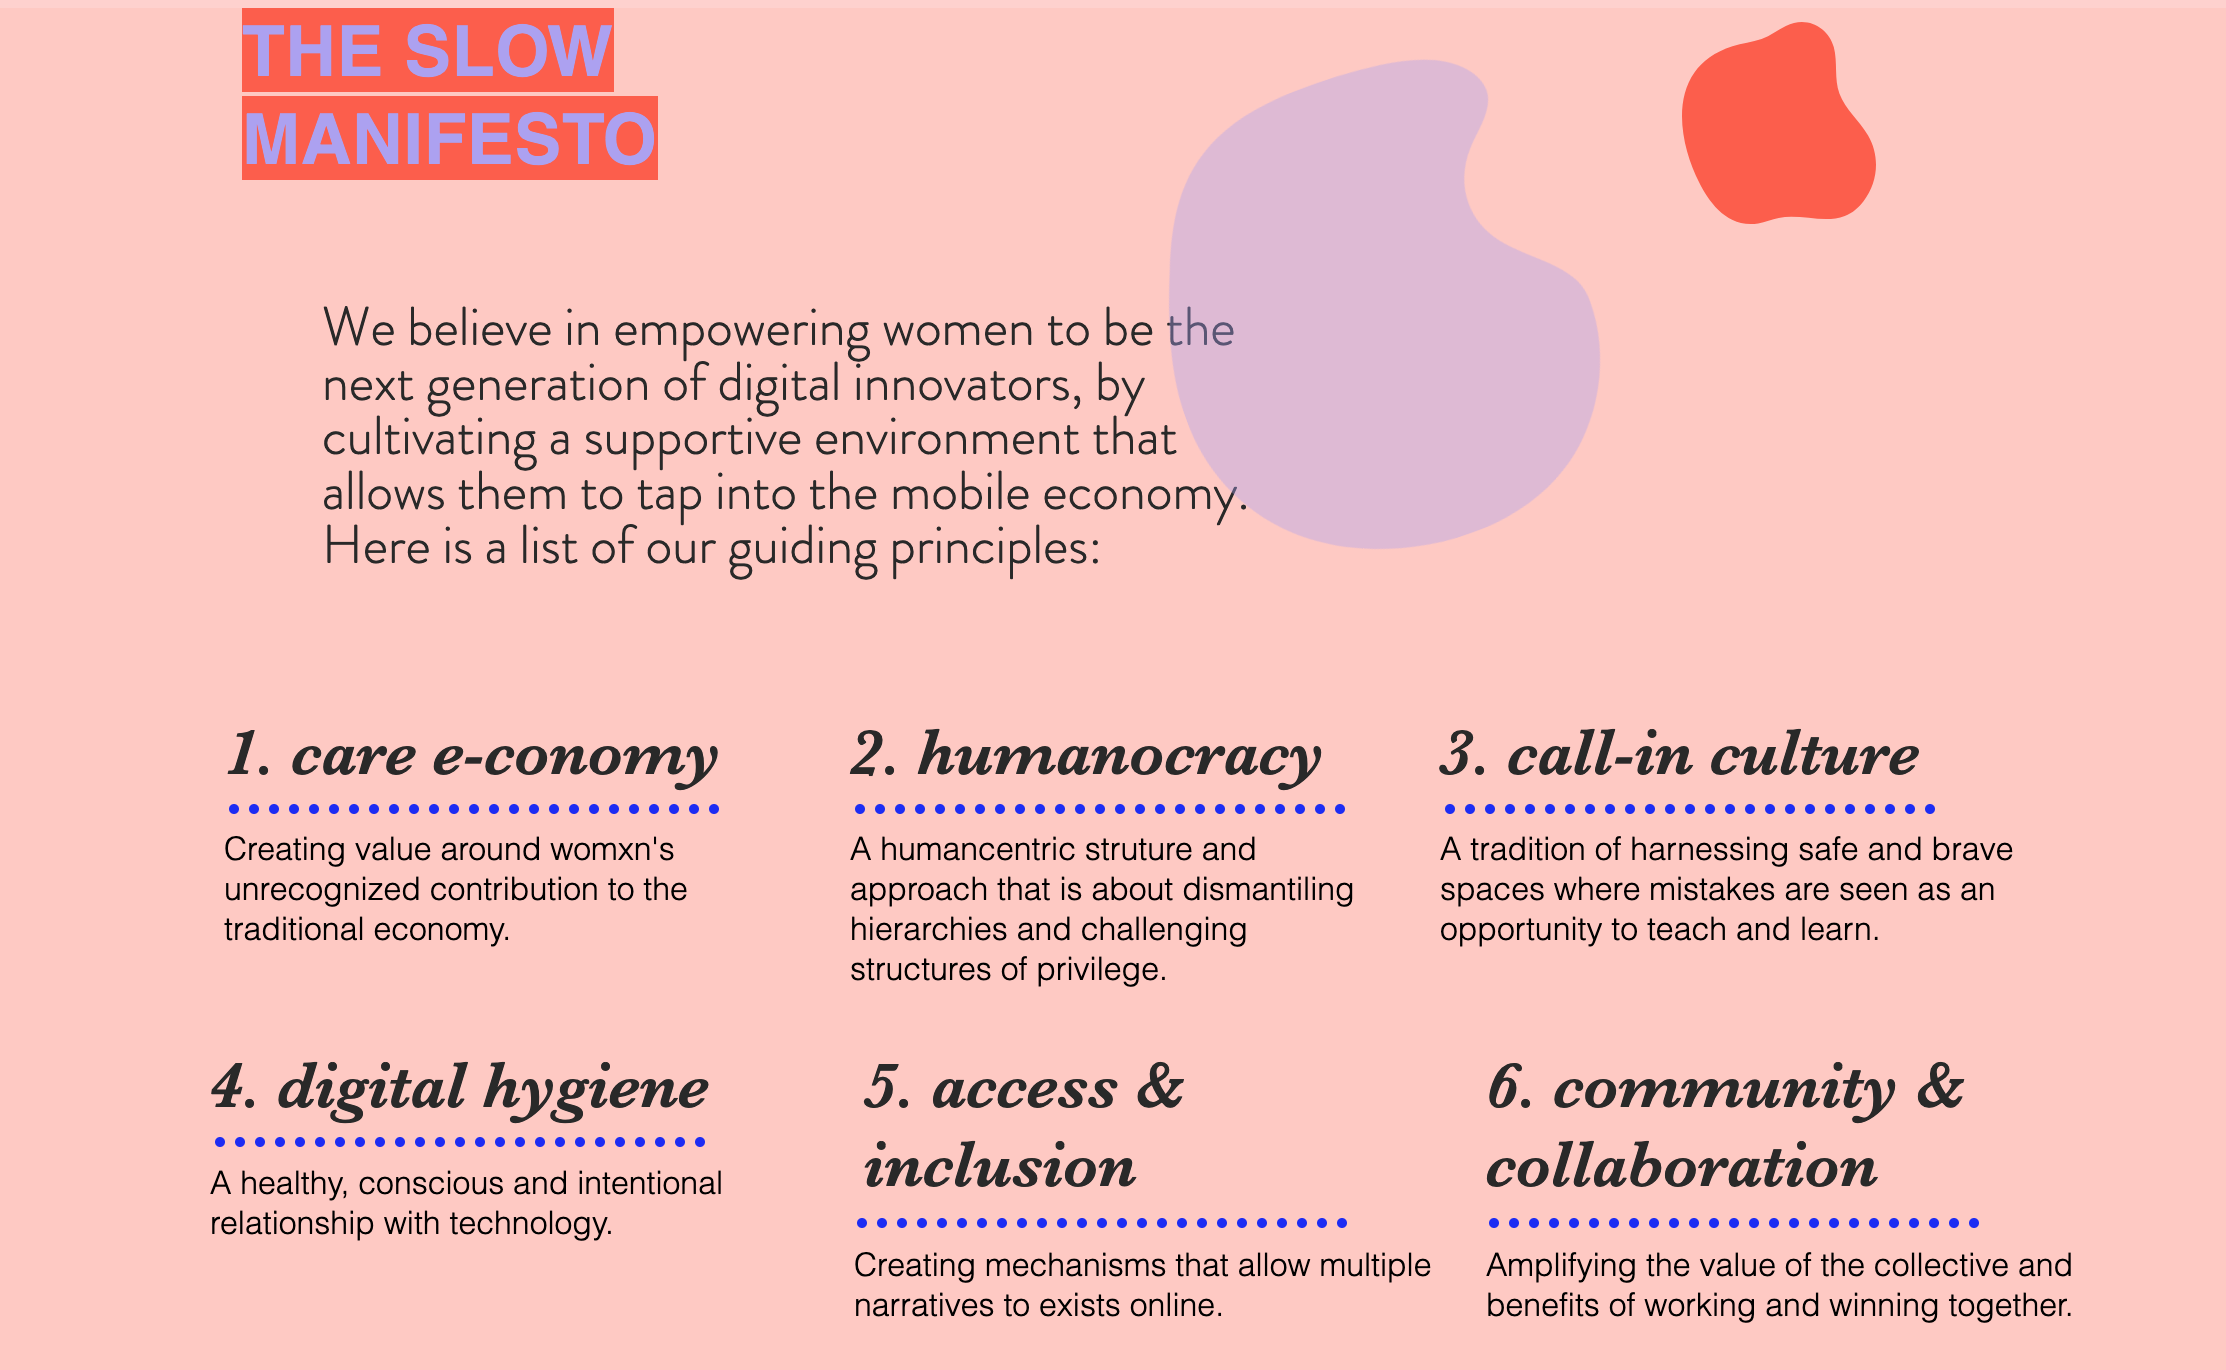 The Slow Manifesto